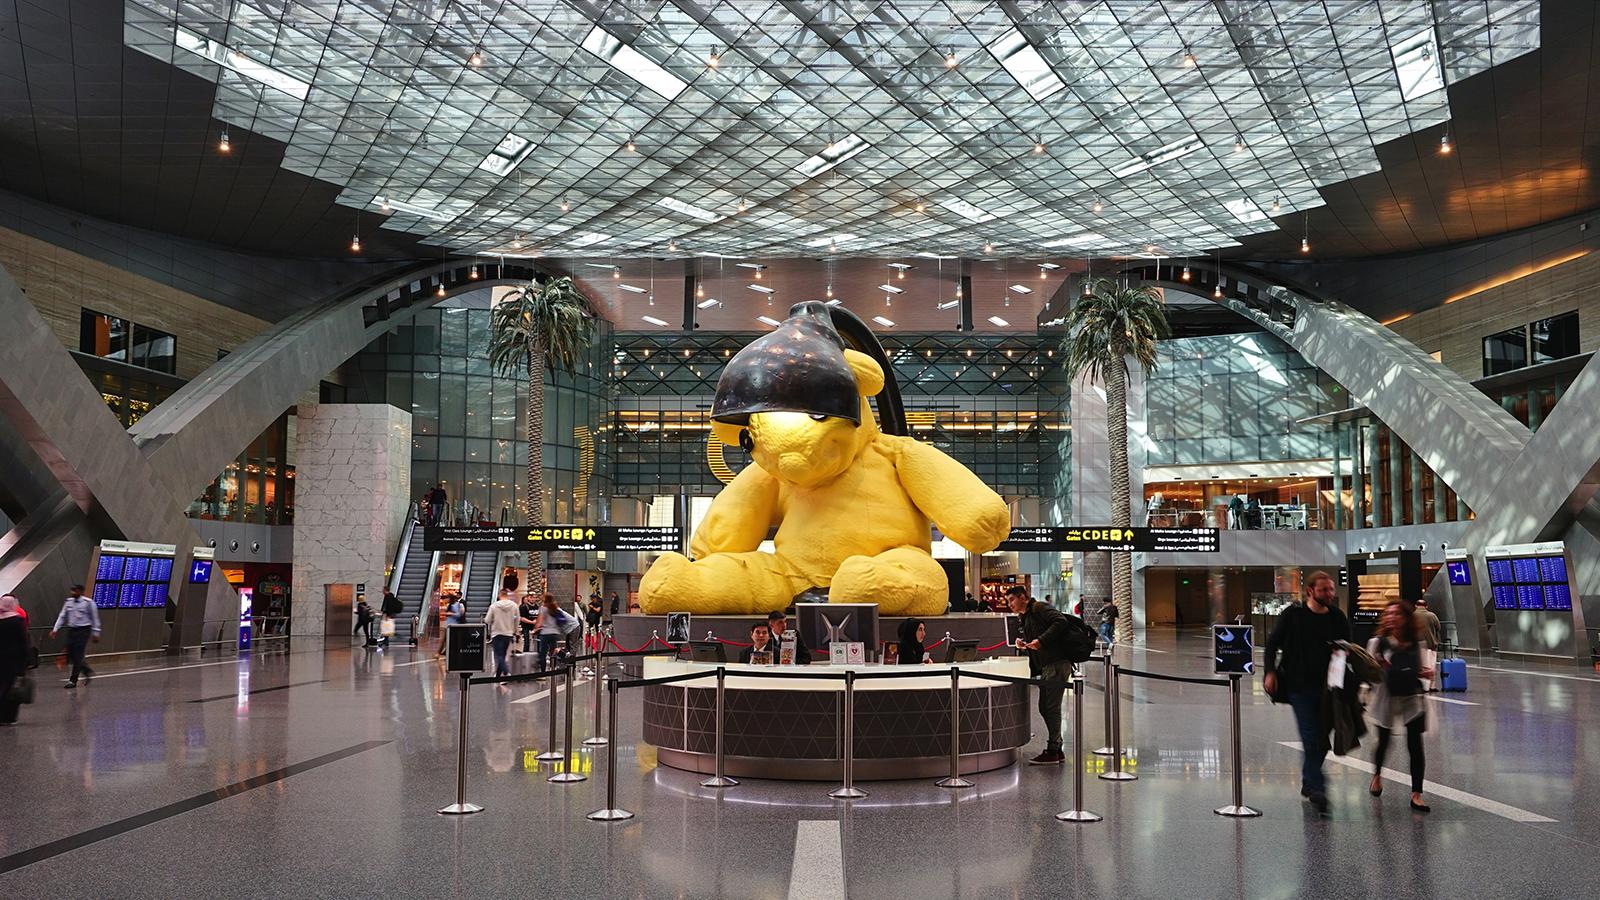 Visa free entry to Qatar during the 'Summer in Qatar' festival